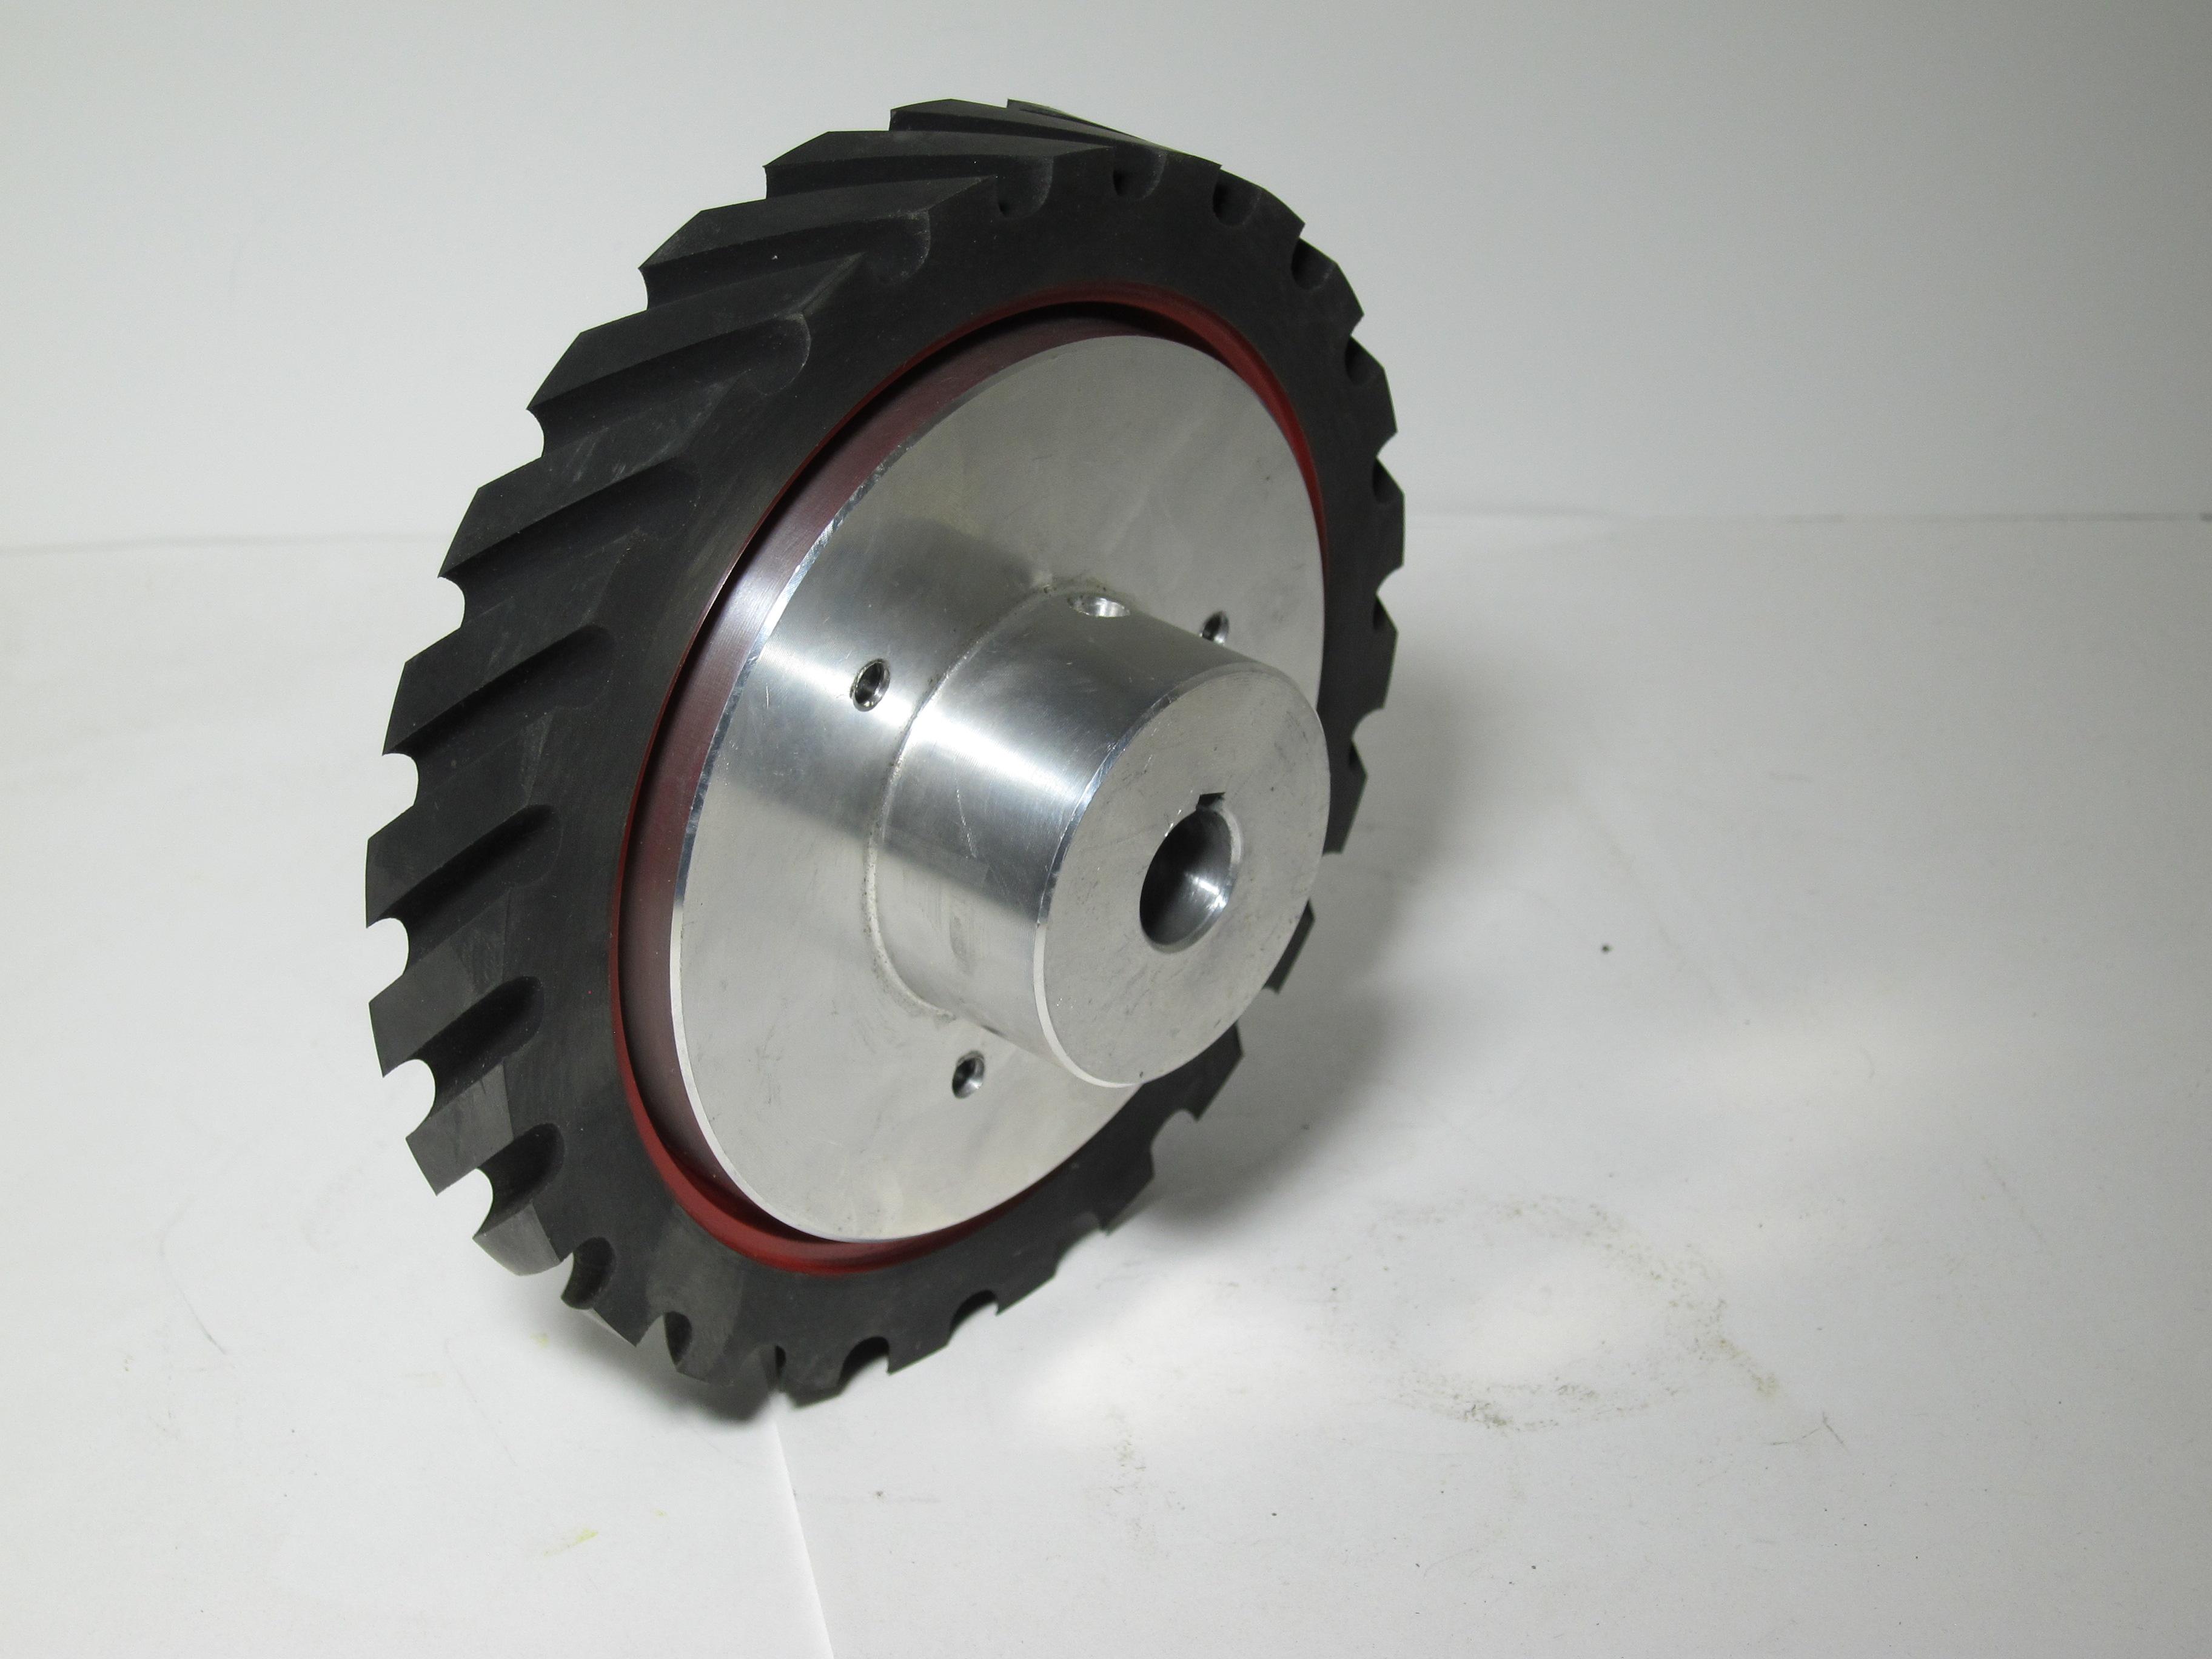 936-034 BG142 1 x 42 inch kalamazoo contact wheel, contact wheel, kalamazoo contact wheel, belt grinding, grinding